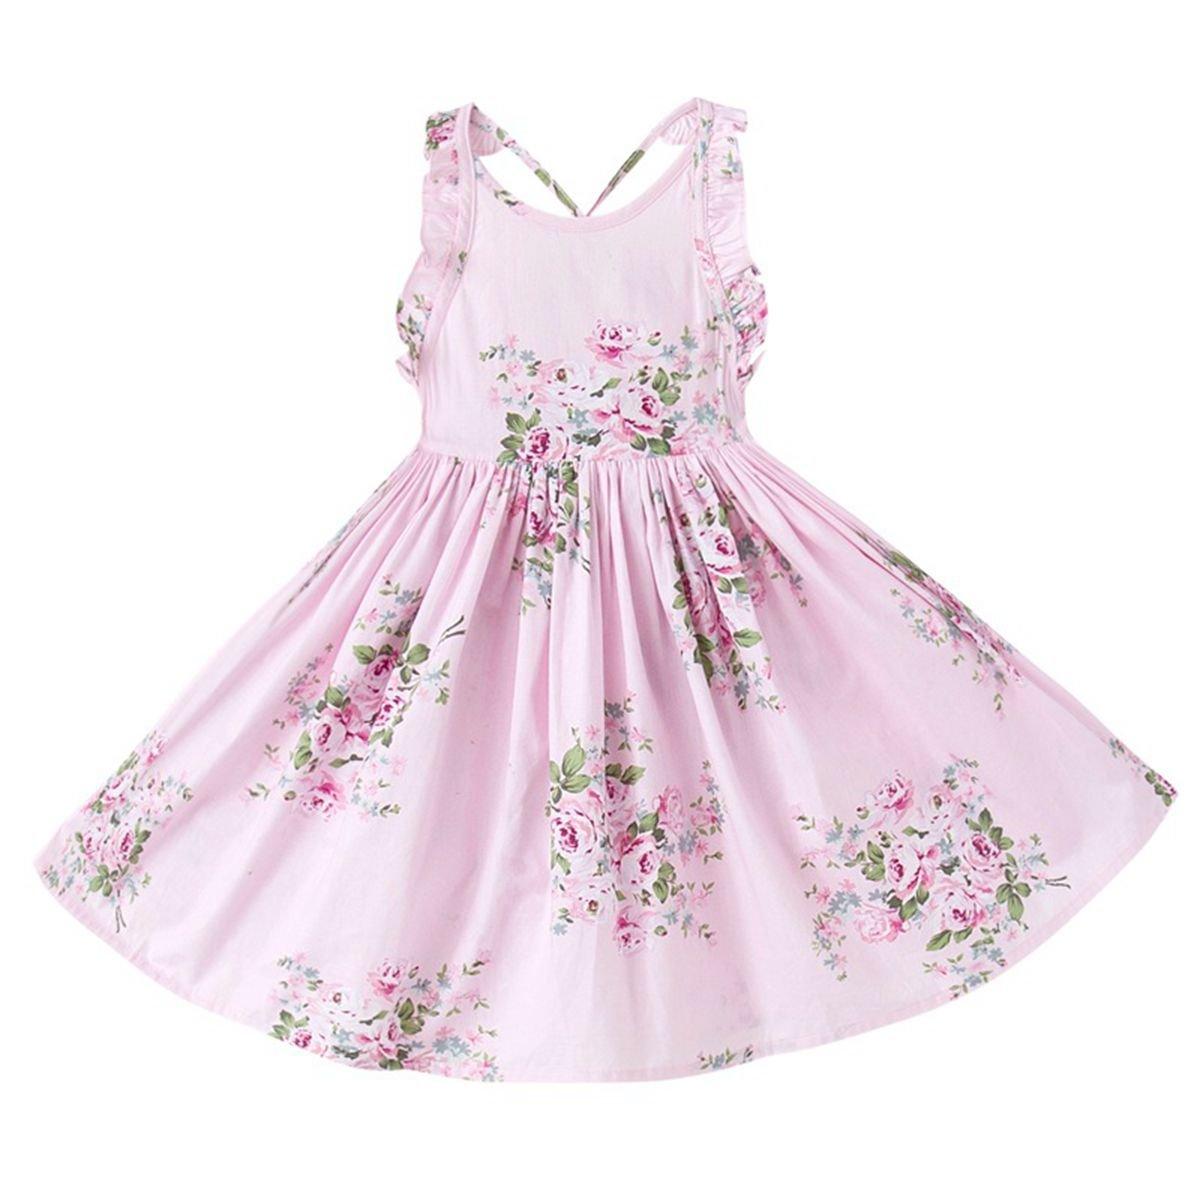 May zhang Little/Big Girls' Dress Sleeveless Cotton Dress,Girls Countryside Overalls Flower Print for Summer (Pink, 3T)